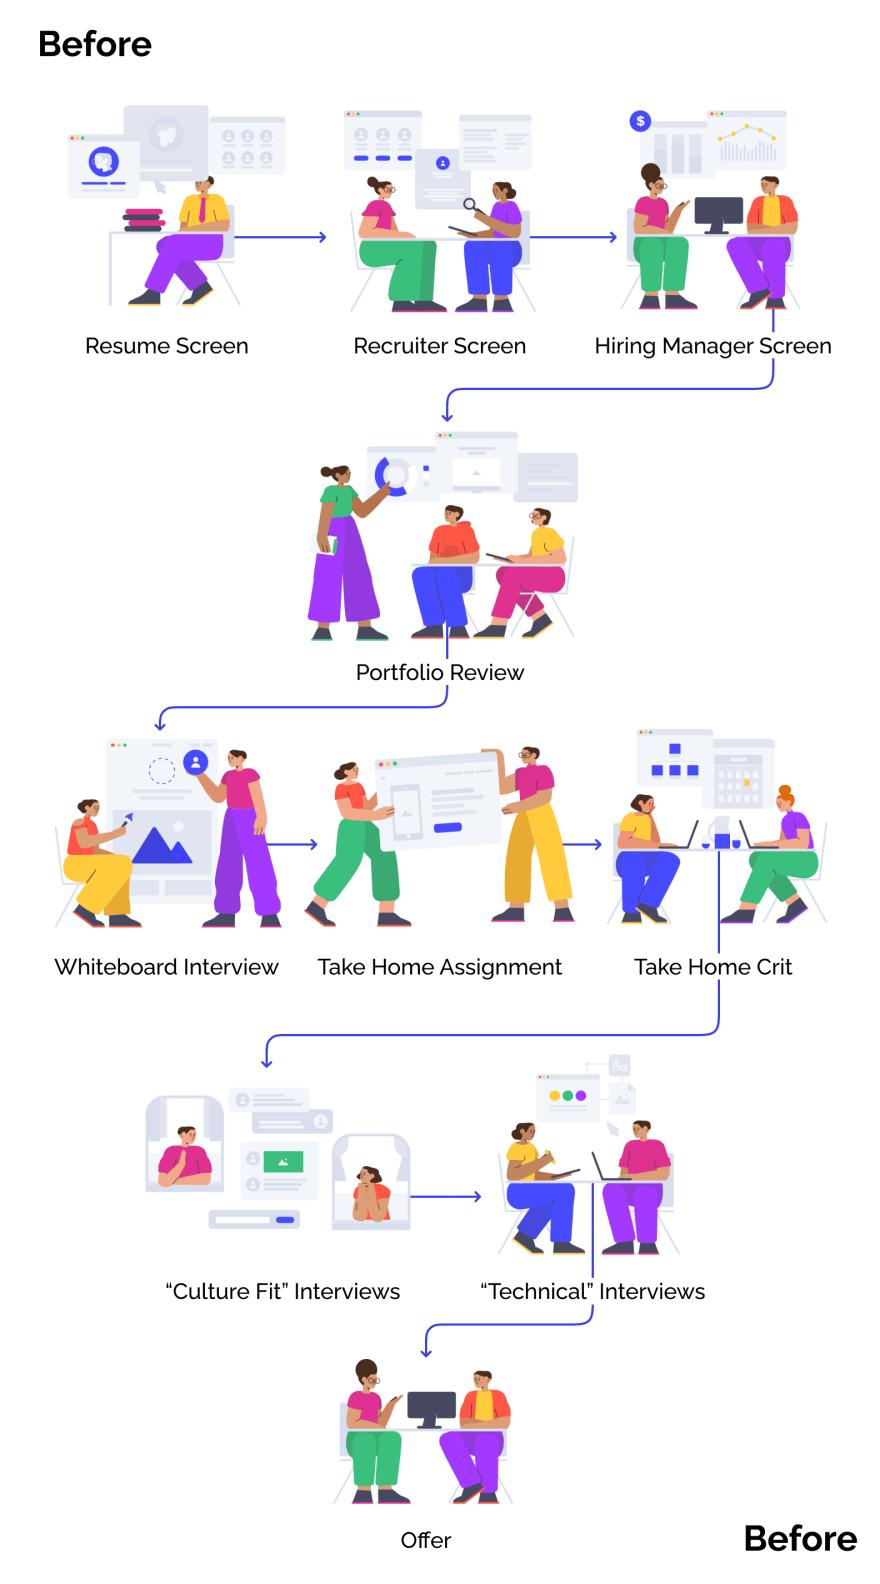 Interview Loop before changes